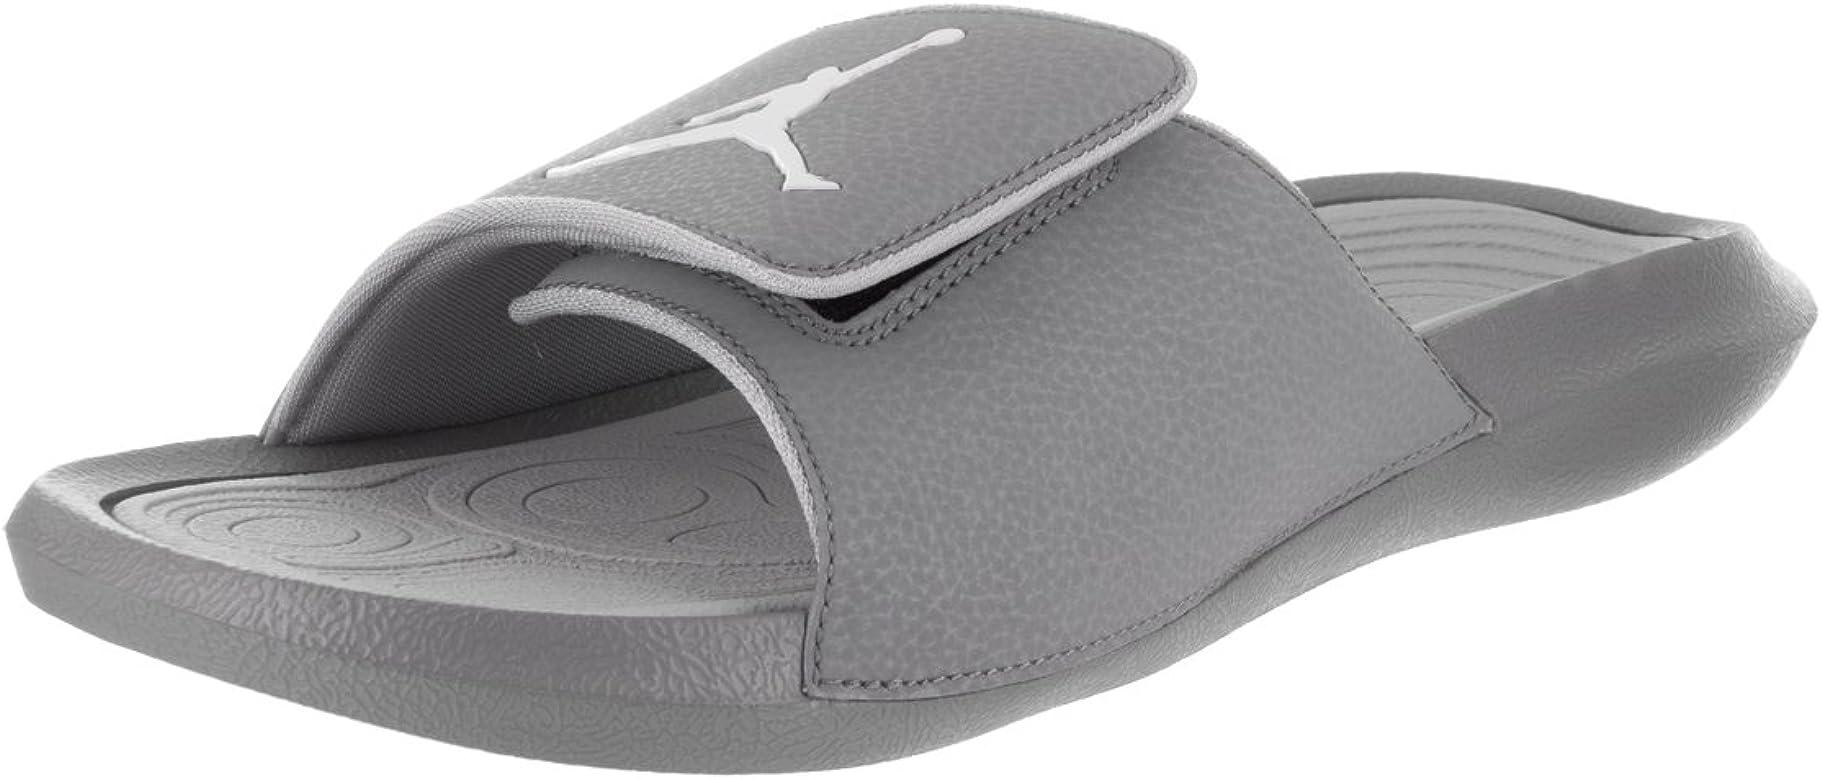 new products 4fc46 52176 Amazon.com   Jordan Nike Men's Hydro 6 Cool Grey/White/Wolf ...